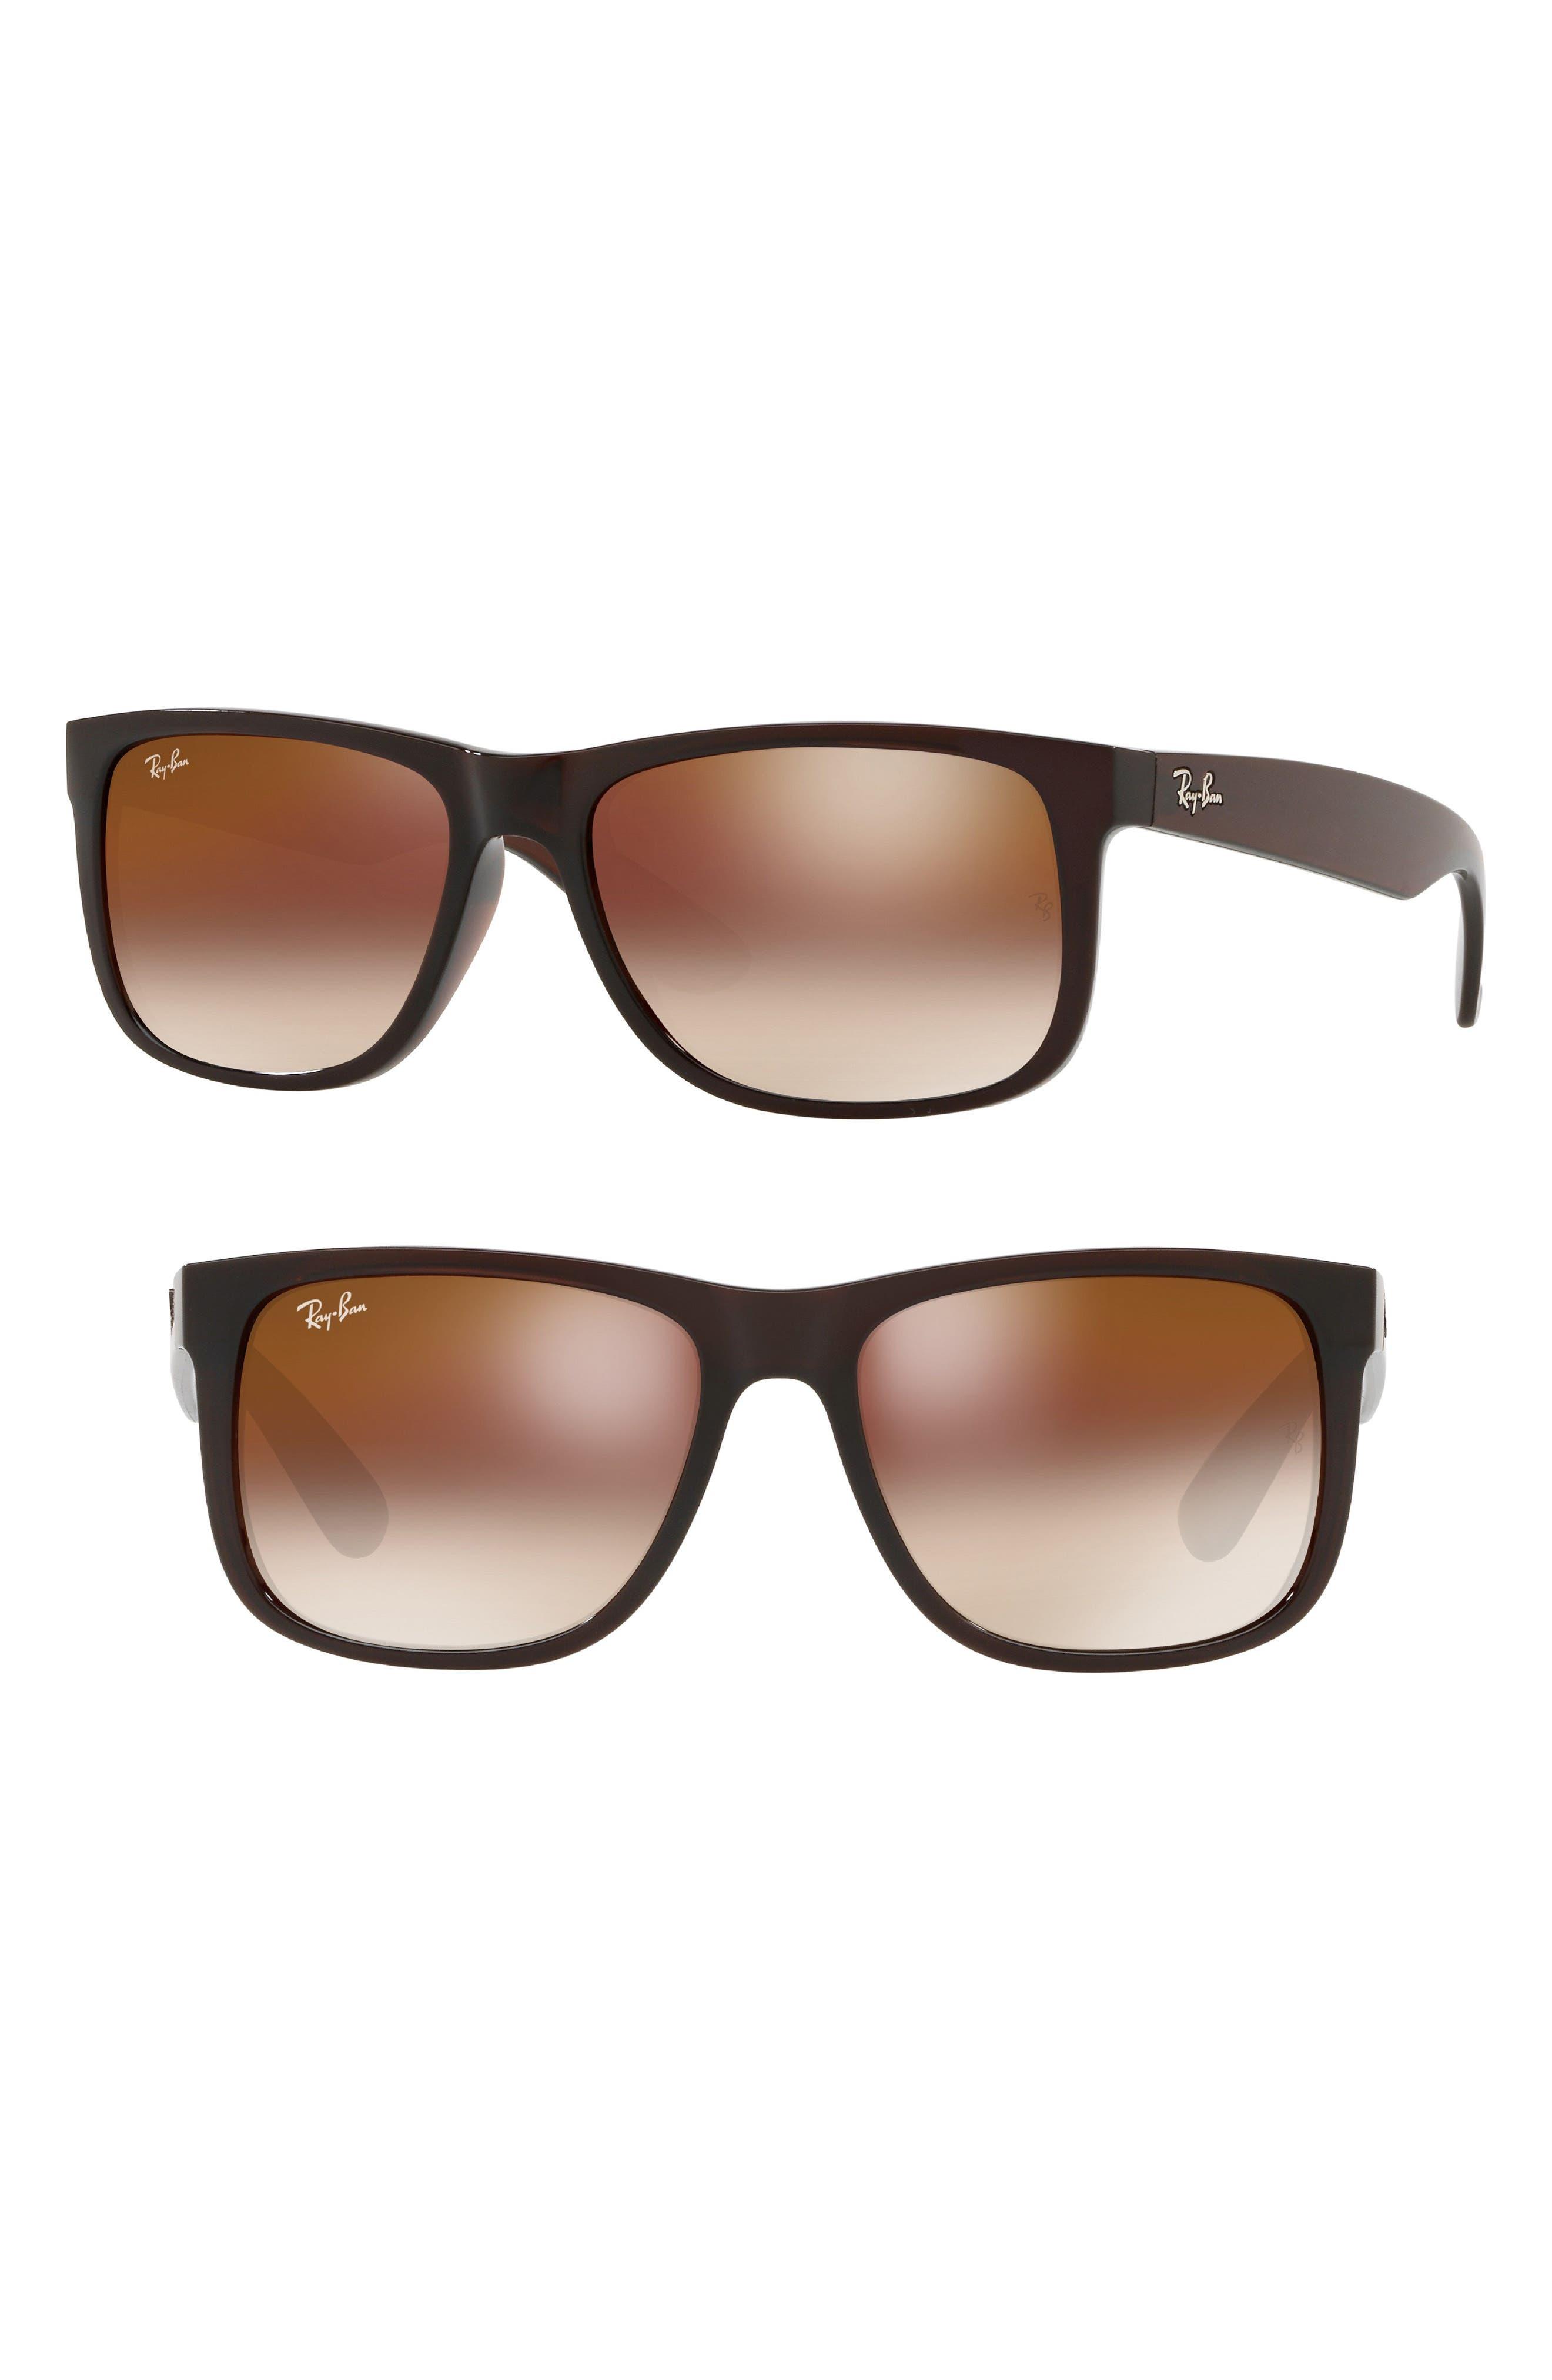 Justin 54mm Sunglasses,                             Main thumbnail 1, color,                             Brown